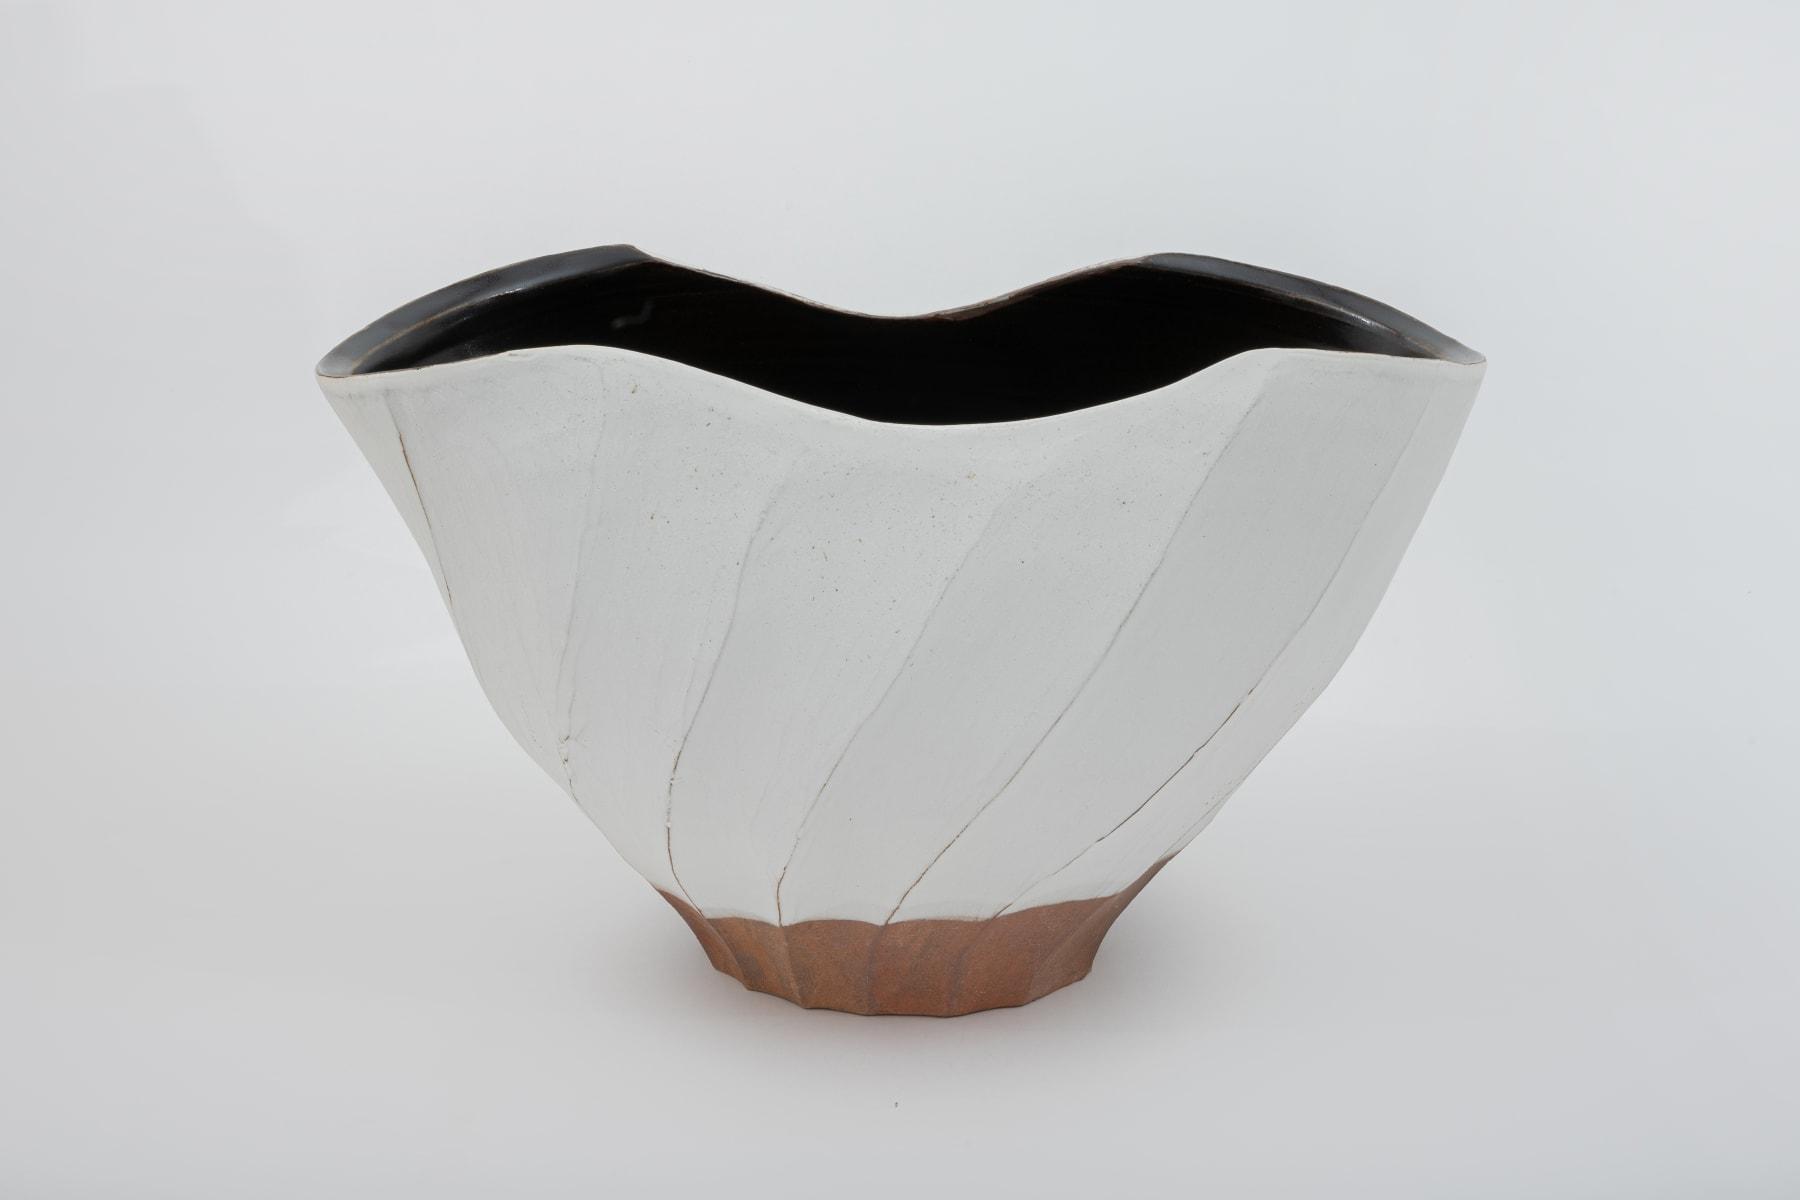 Hosai Matsubayashi XVI, Kohiki and Black glaze Vase / 花器 粉引黒釉, 2020